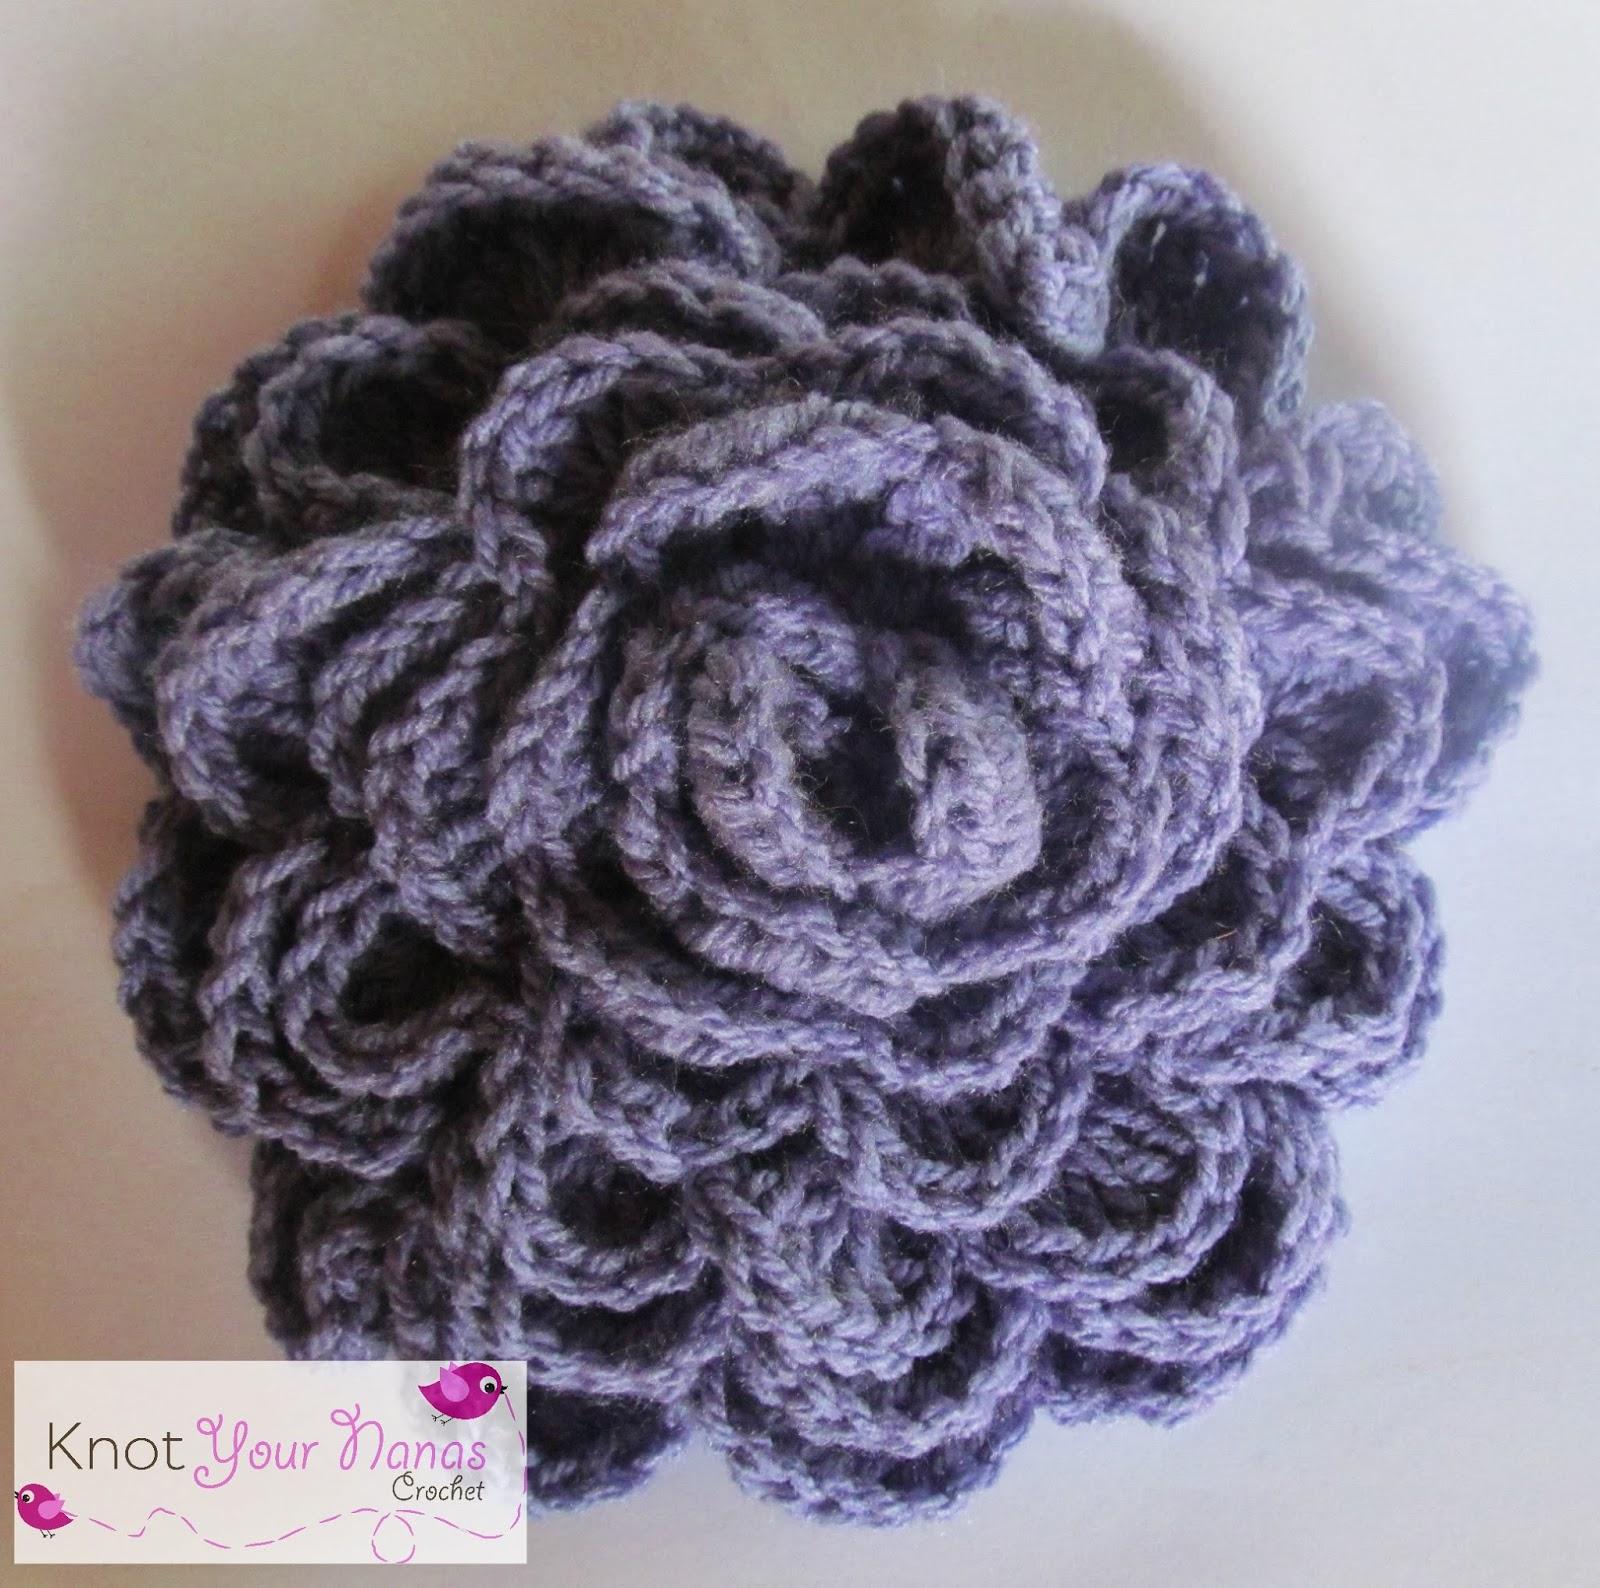 Knot your nanas crochet simple crochet roses 3 sizes simple crochet roses 3 sizes bankloansurffo Gallery